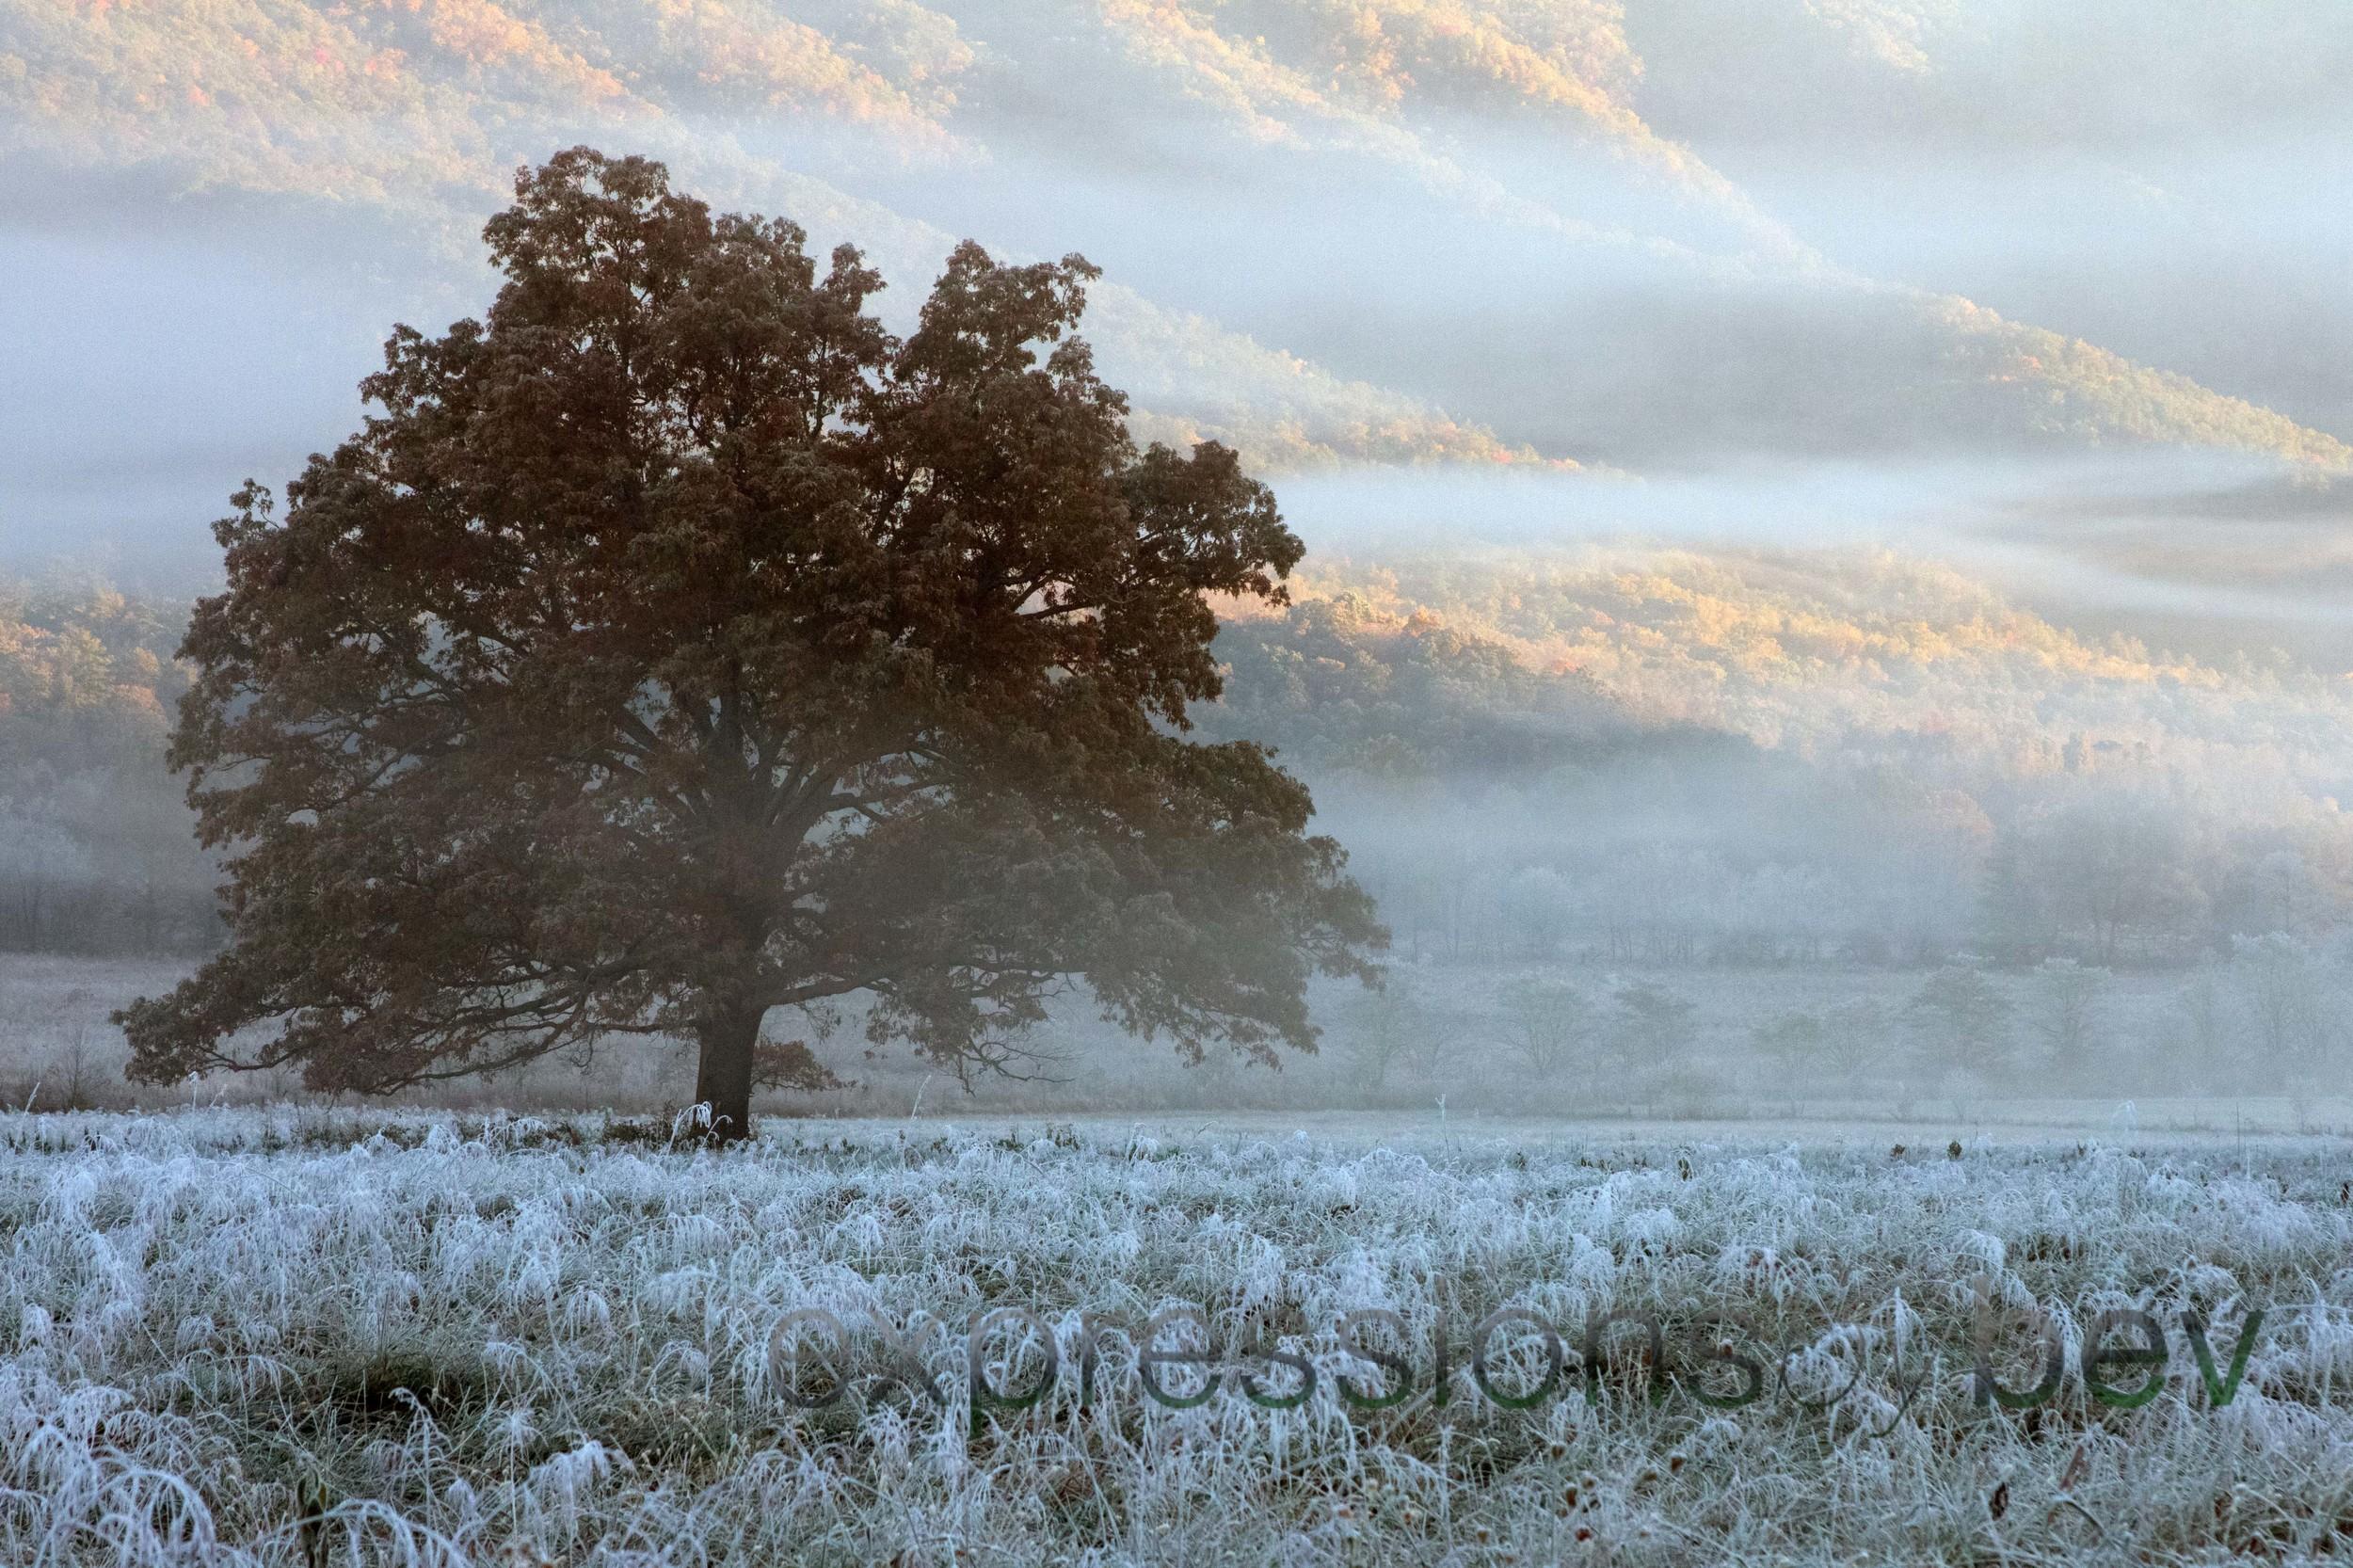 EBBev-2013-CNPA cades cove,treemont,roaring fork,sunrise,frost,spiderwebs,-3414-55a_-7.jpg